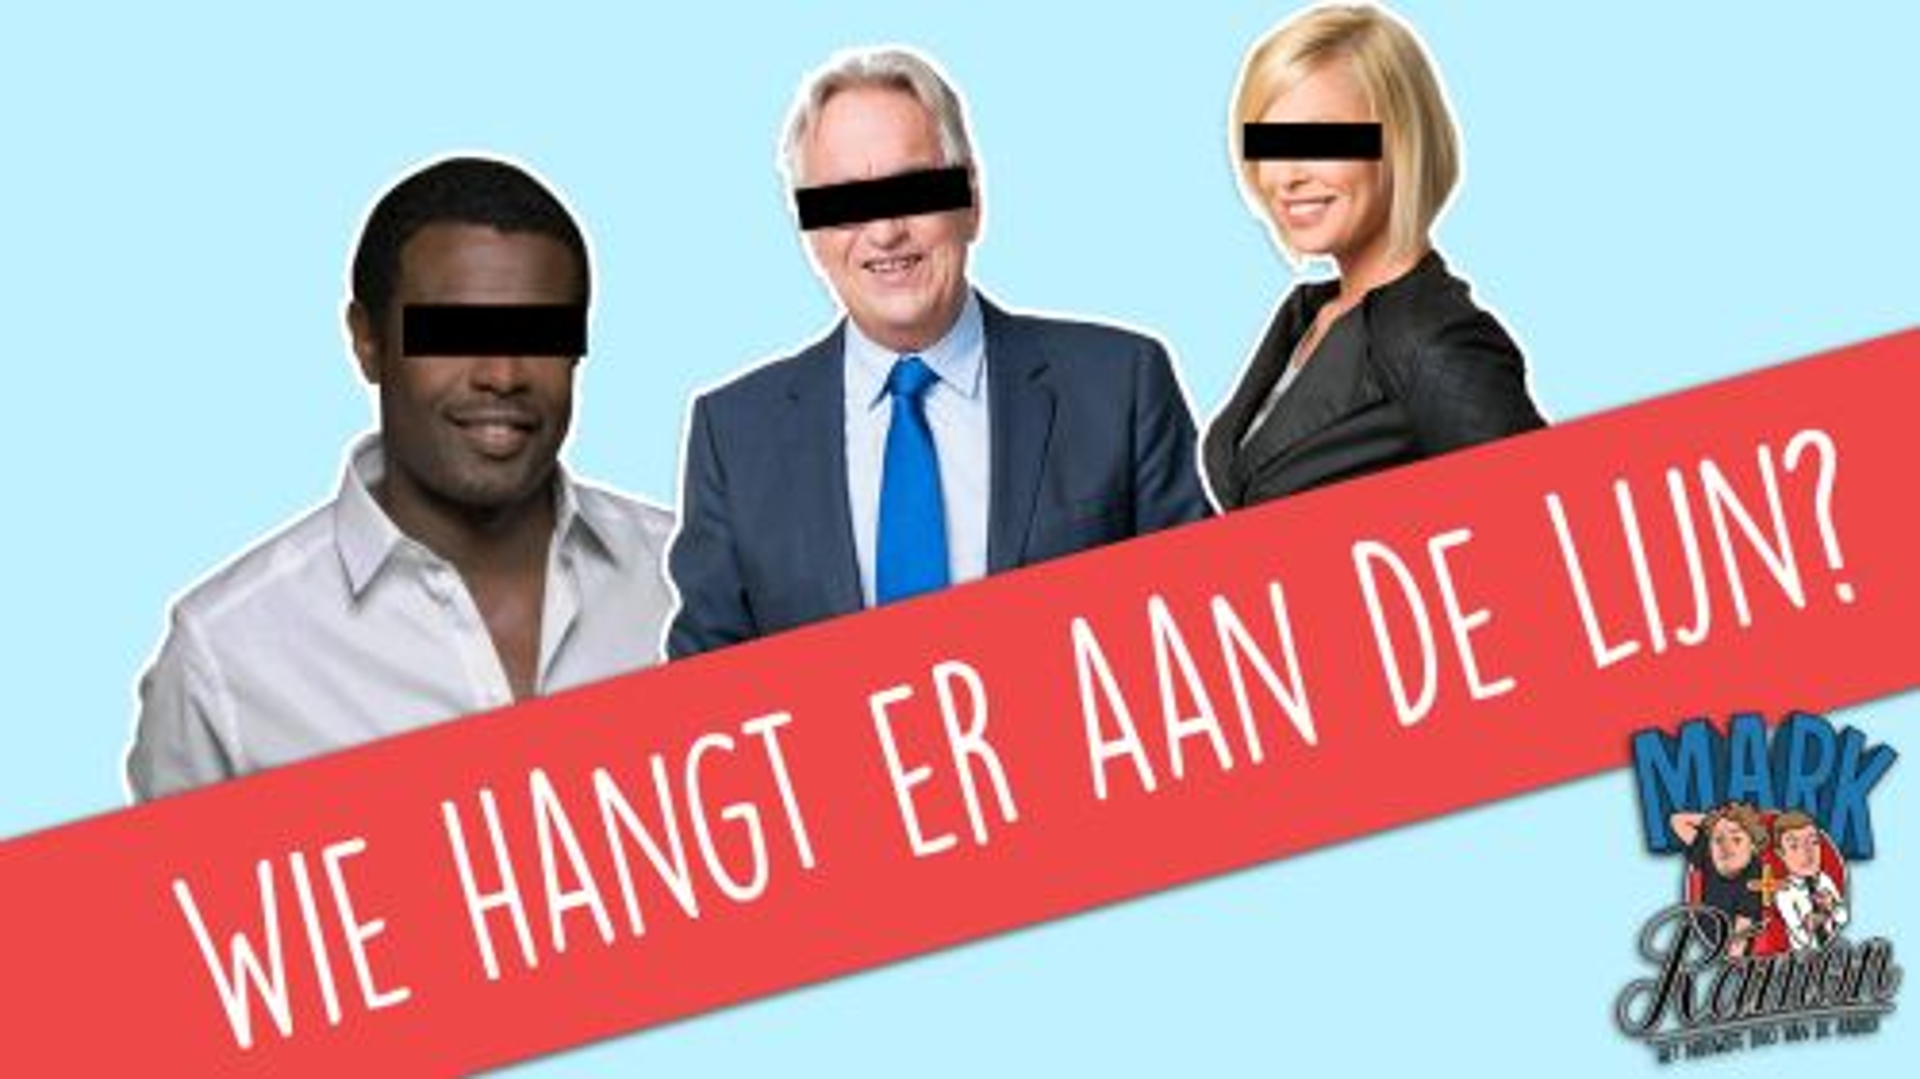 WHEADL: Wouter heeft later 5 miljard euro op de bank staan!